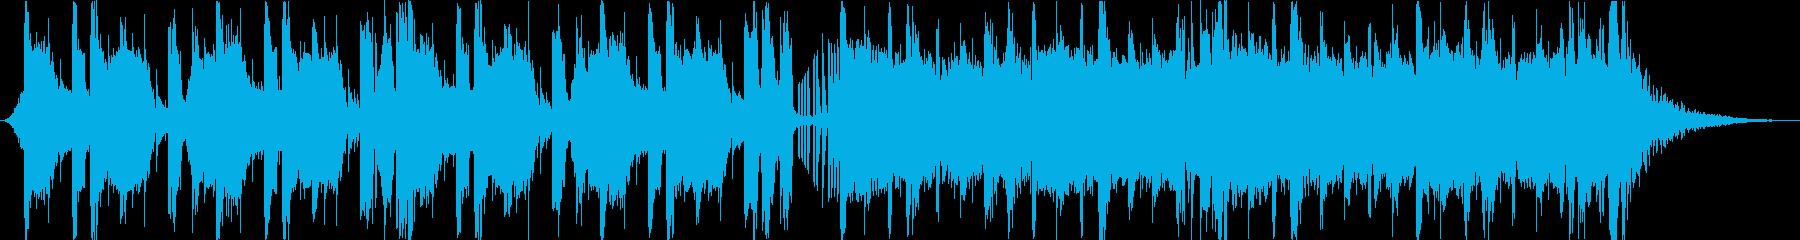 eスポーツ大会 EDM 60秒オケのみの再生済みの波形